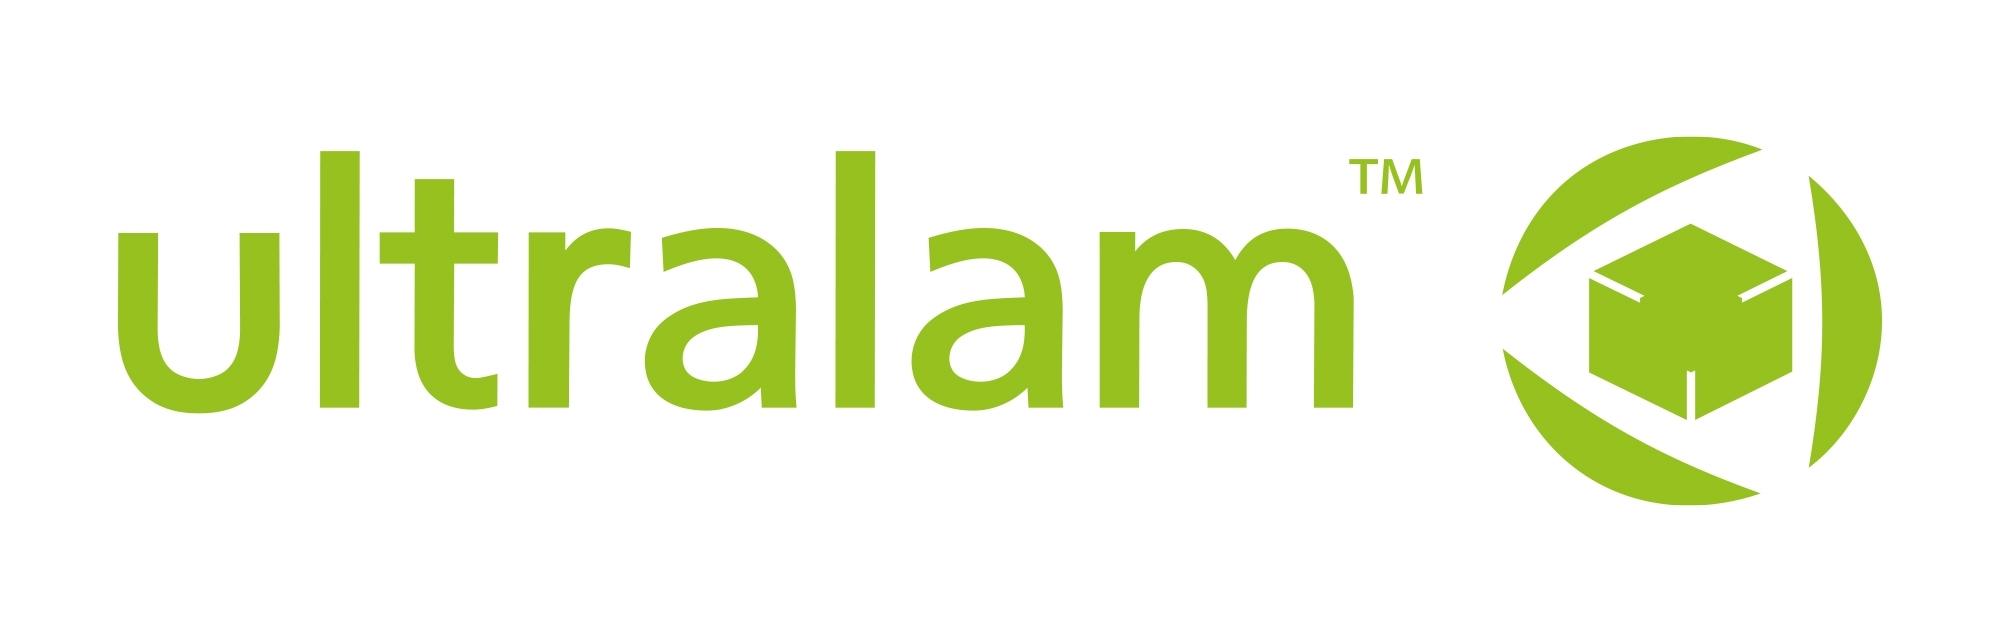 ultralam-logotipas